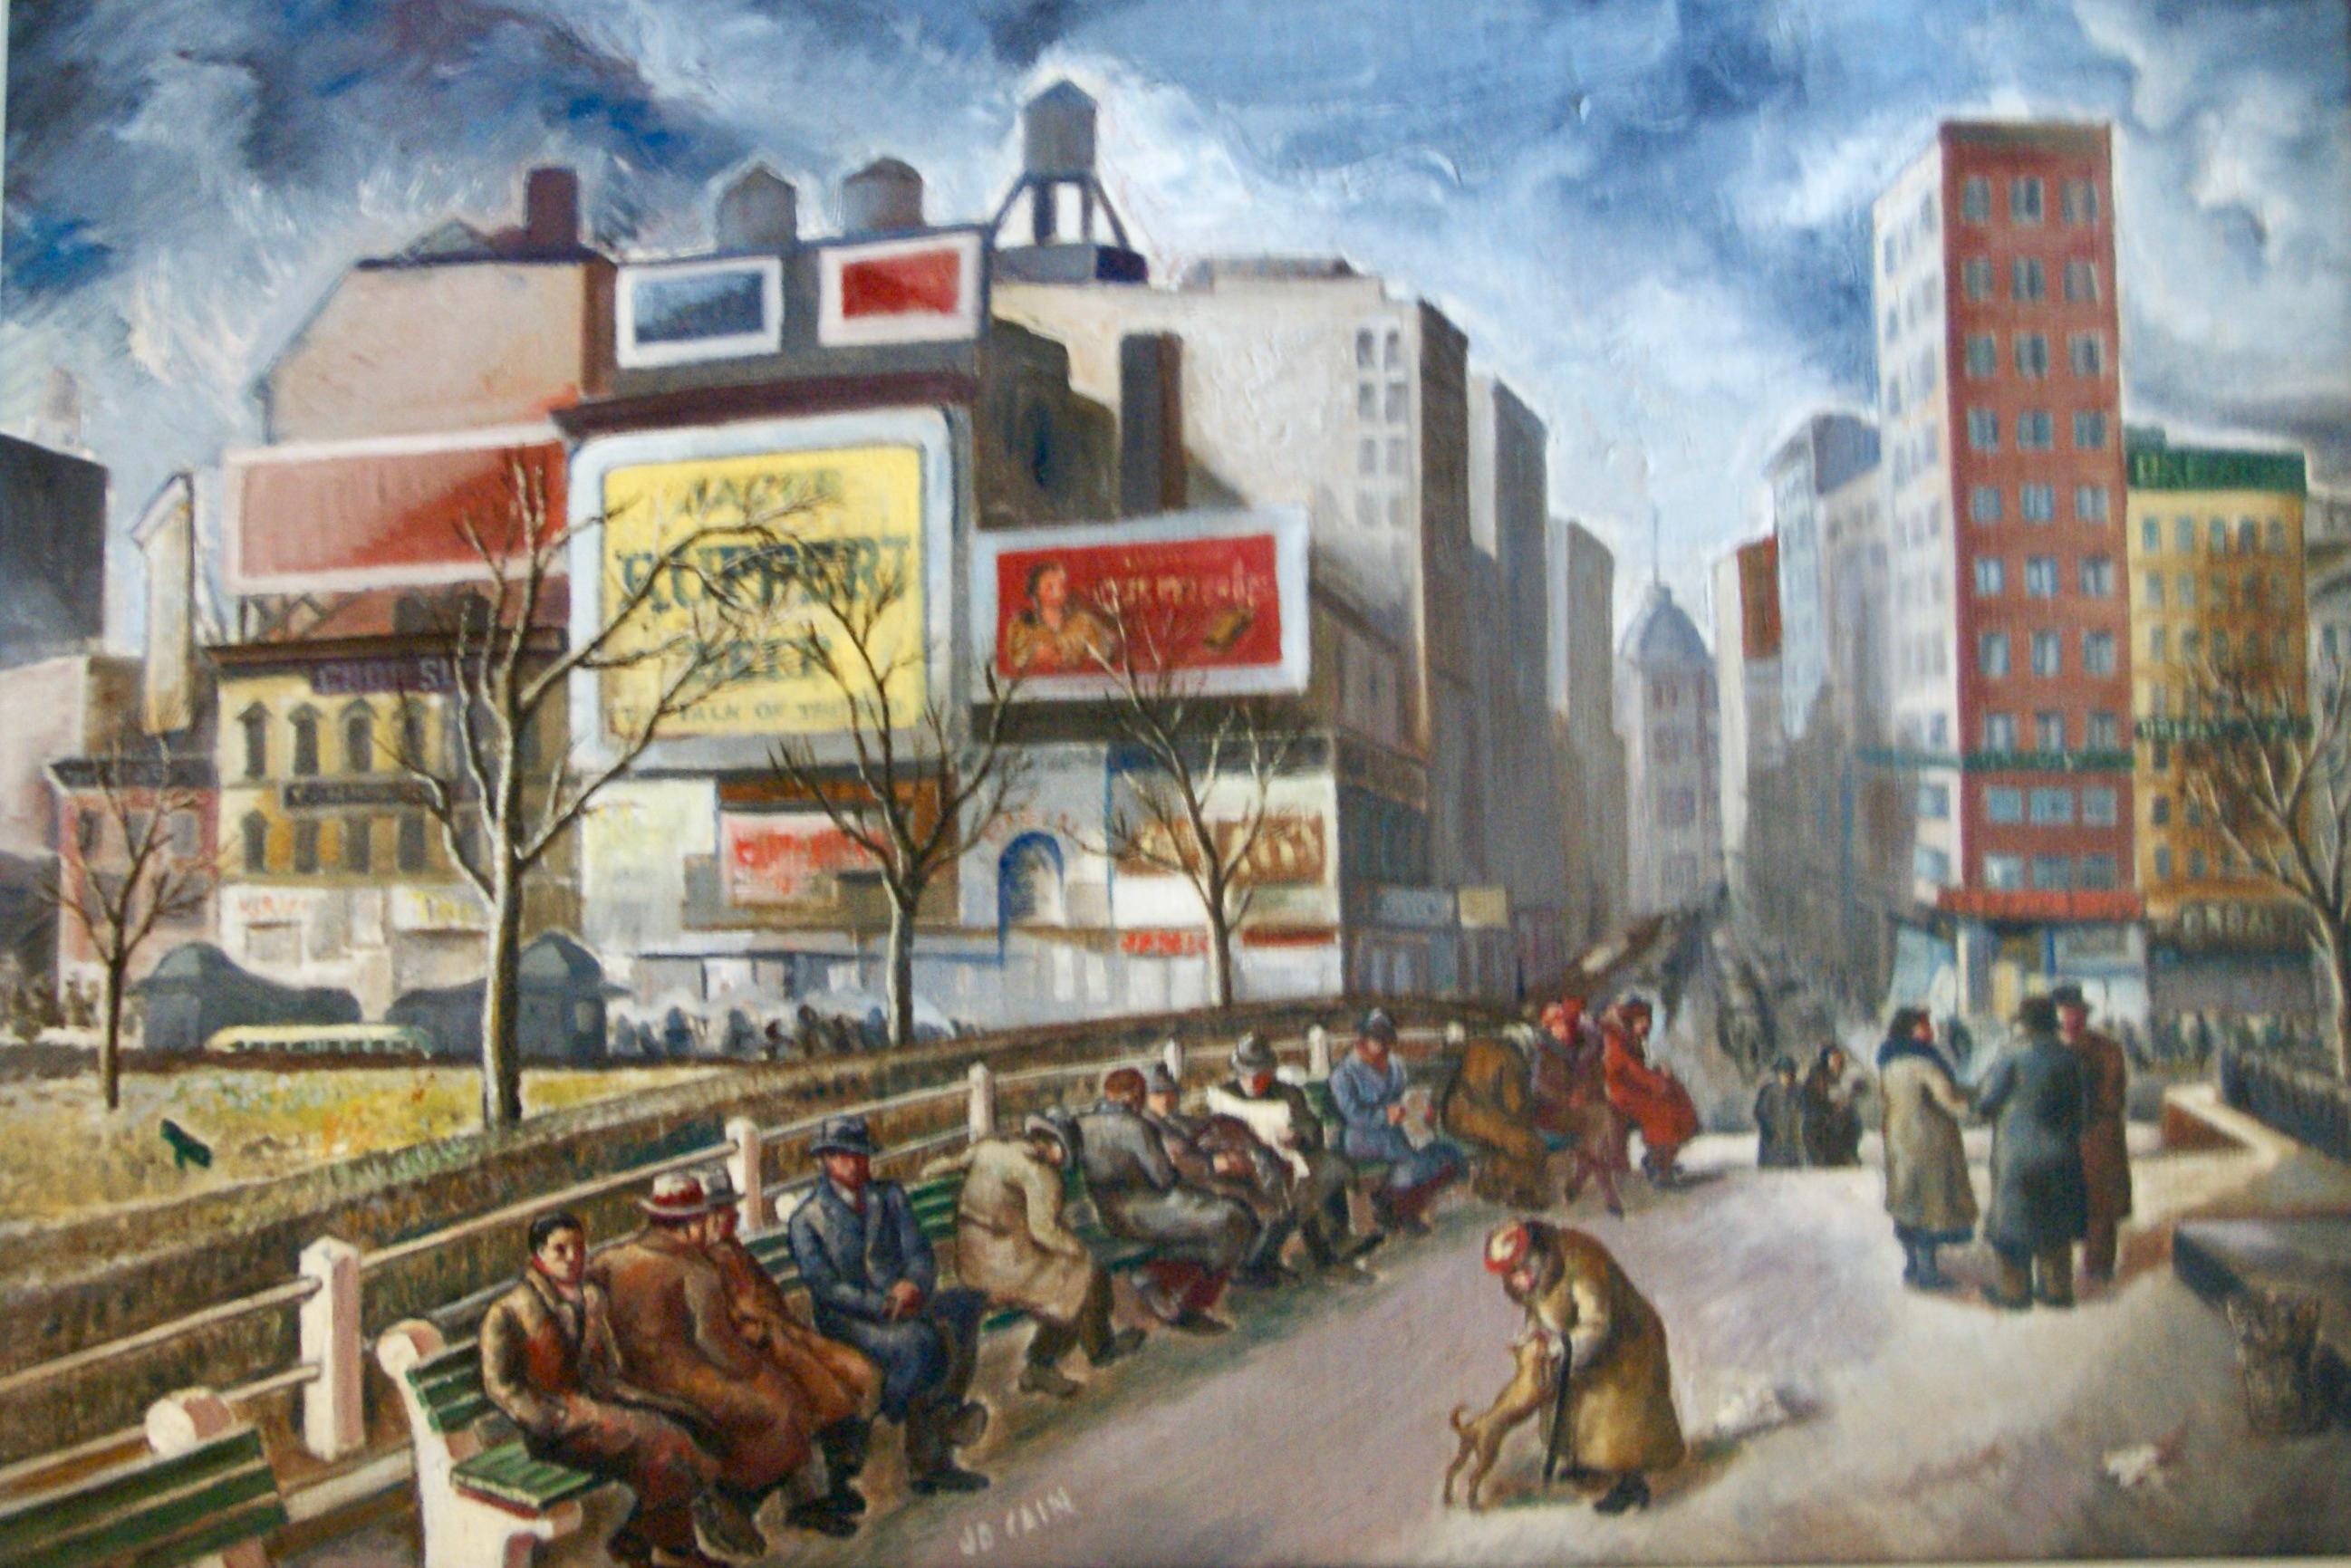 UNION SQUARE Depression Era Oil Painting WPA Realism American Scene Realism NYC